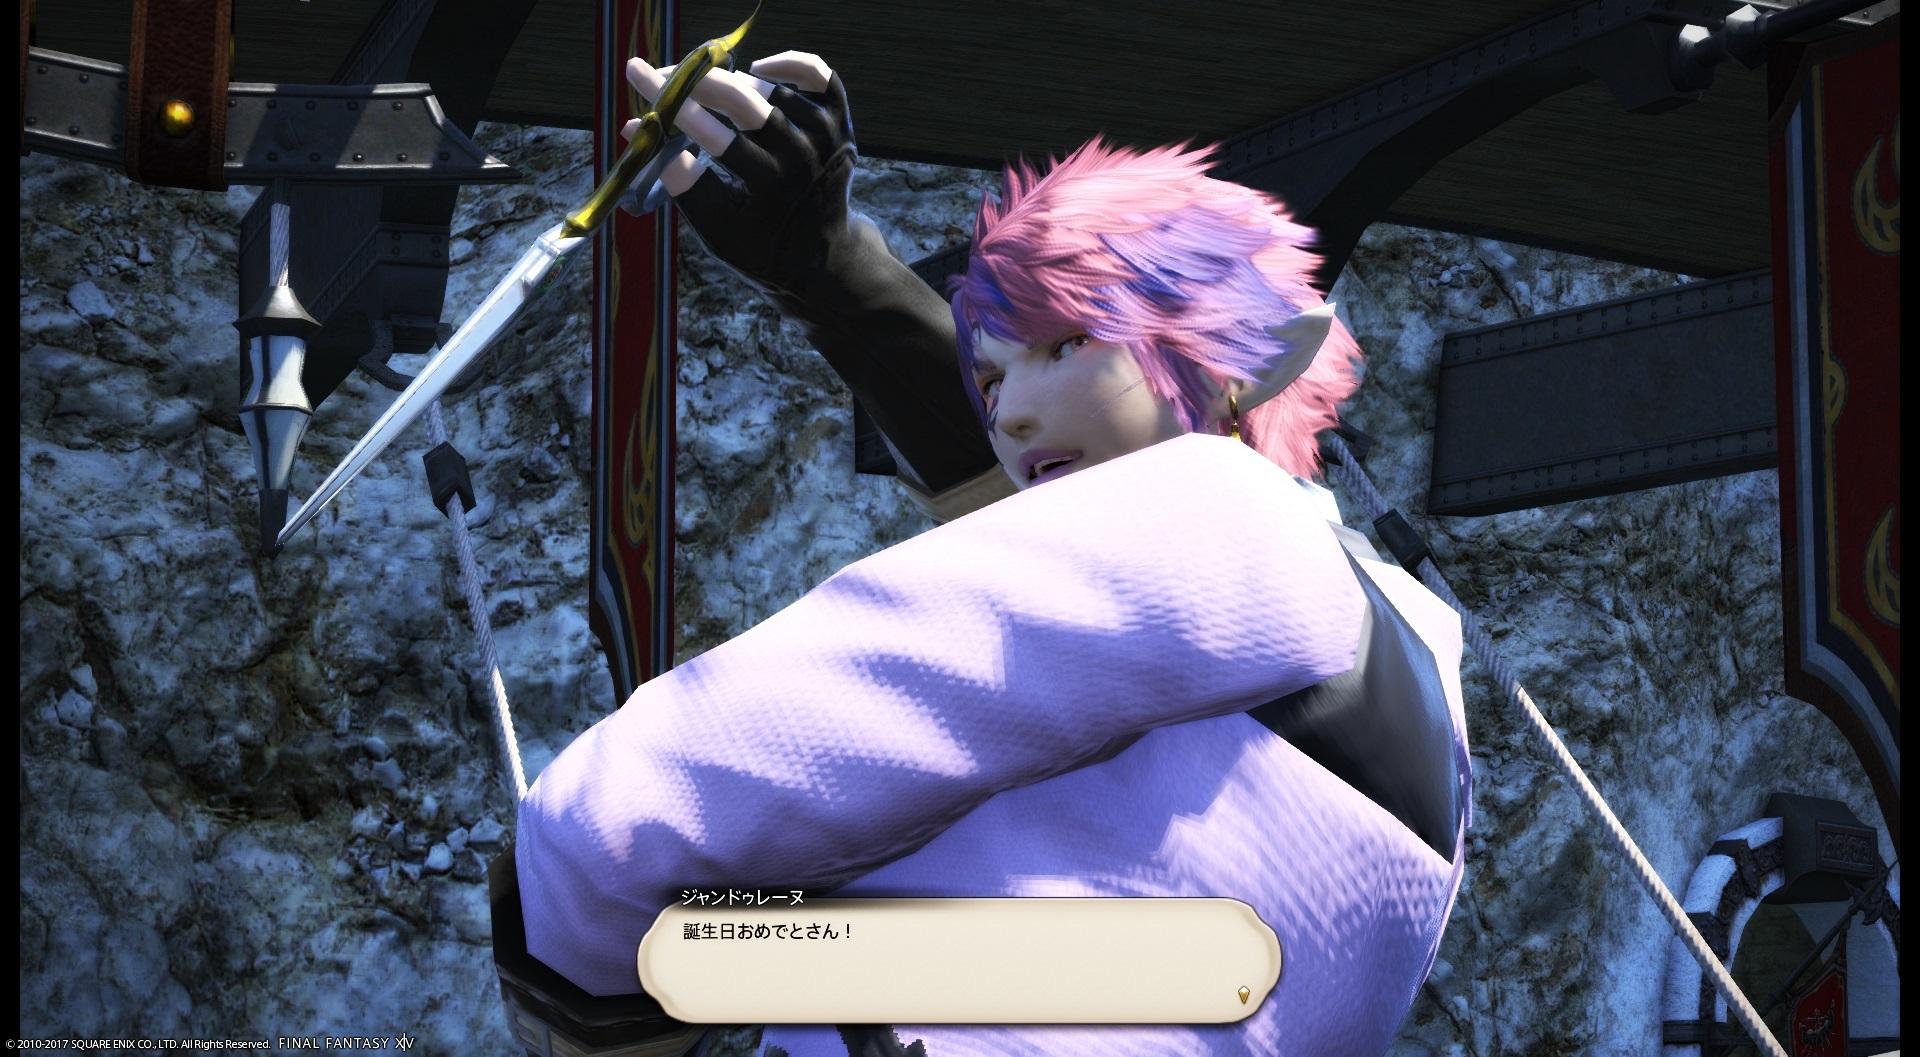 [PCゲーム]FINAL FANTASY XIVの世界へ6